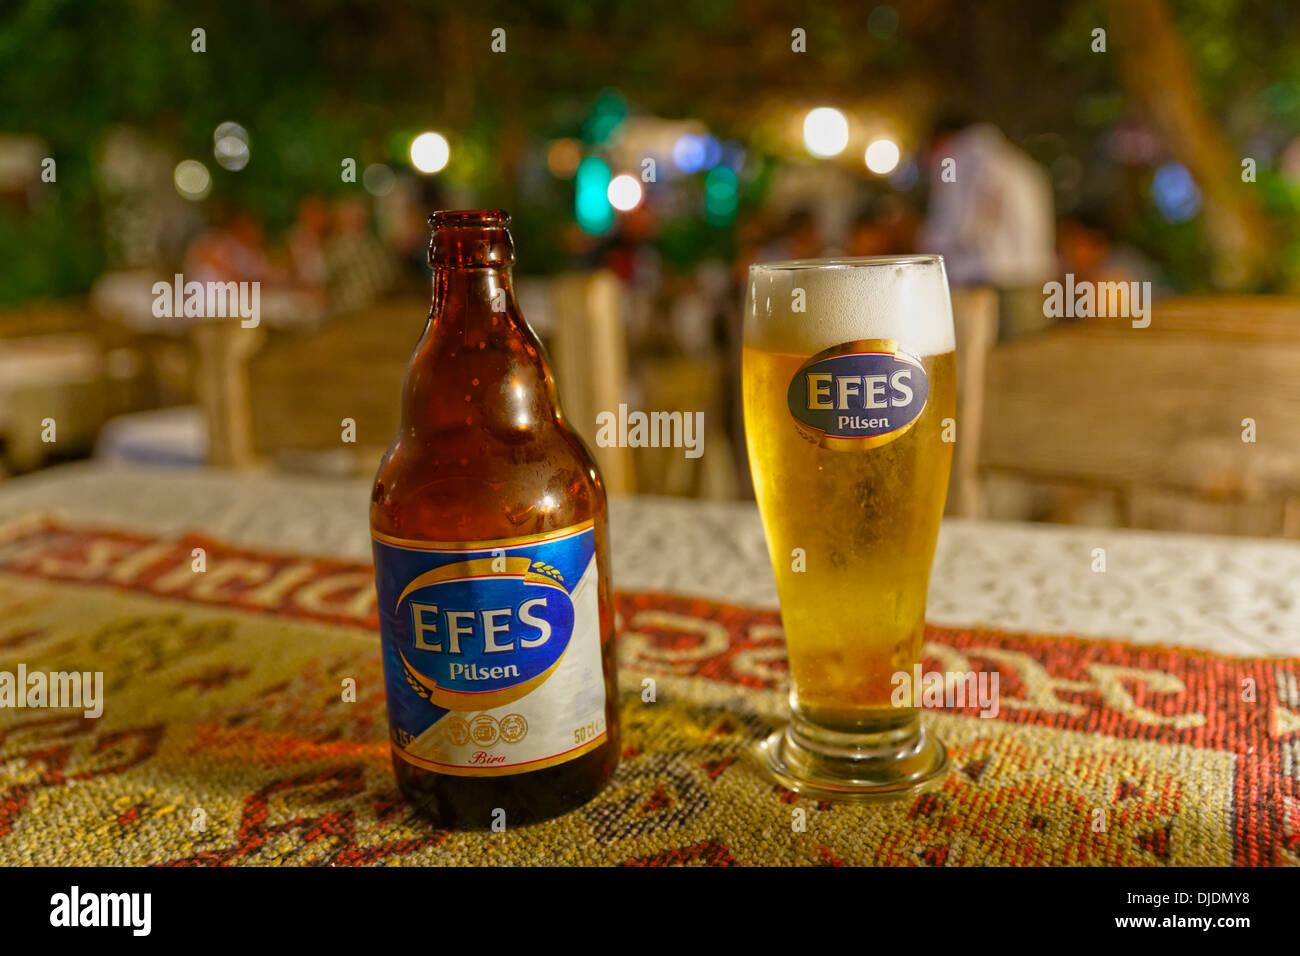 Efes Pilsen beer bottle and beer glass, Dalyan, Muğla Province, Turkish Riviera or Turquoise Coast, Aegean, Turkey Stock Photo